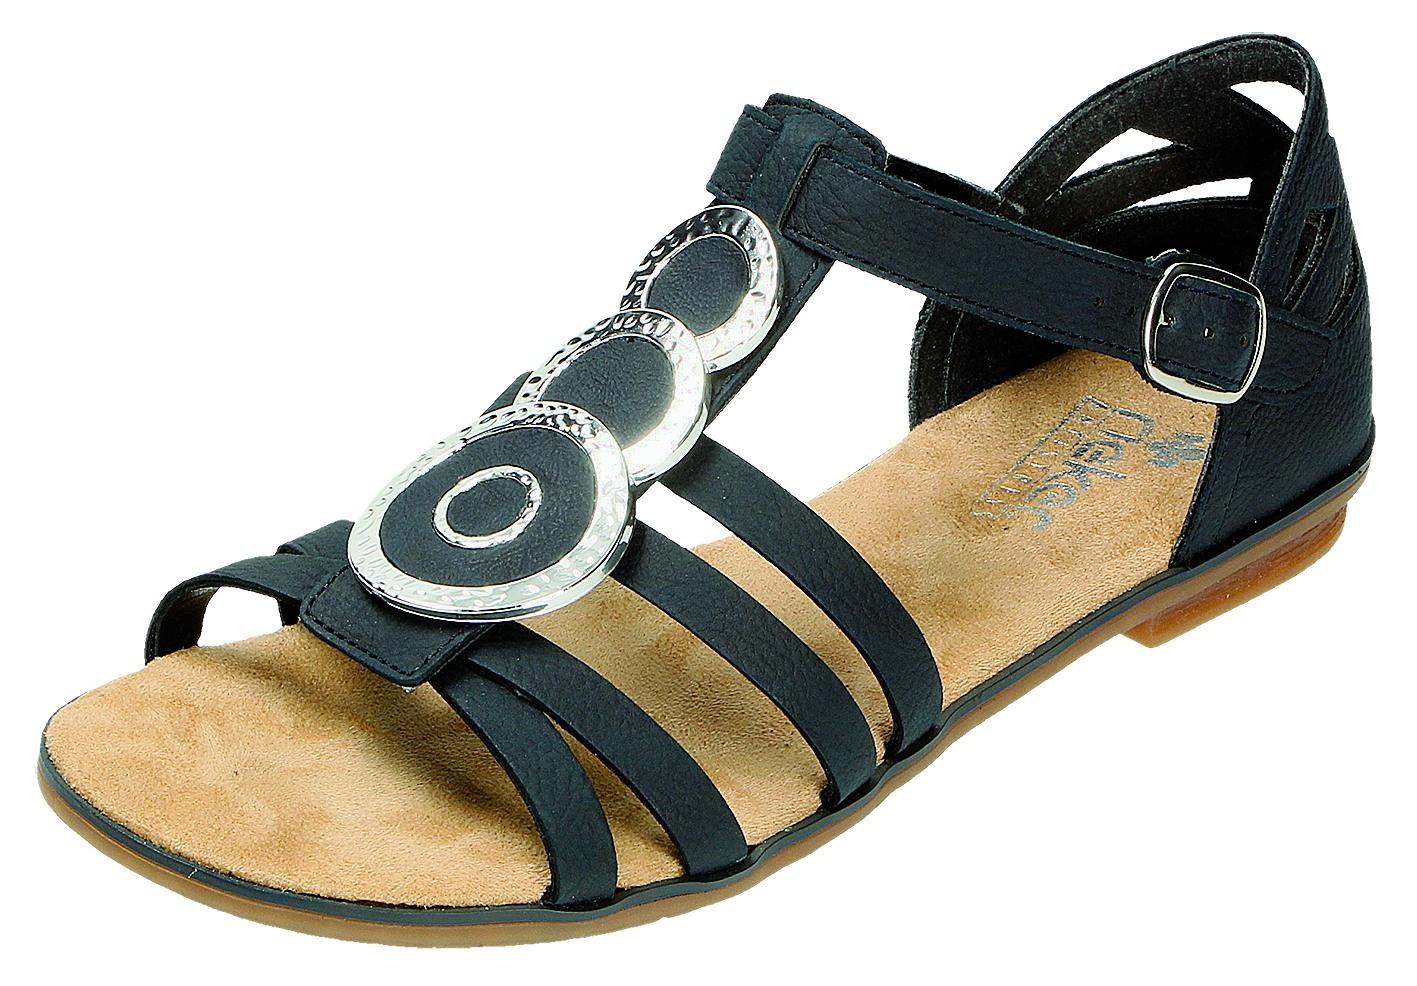 Details zu Rieker Damen Sandalen Pantolette D.Sandalette Blau 64296 14 PAZIFI